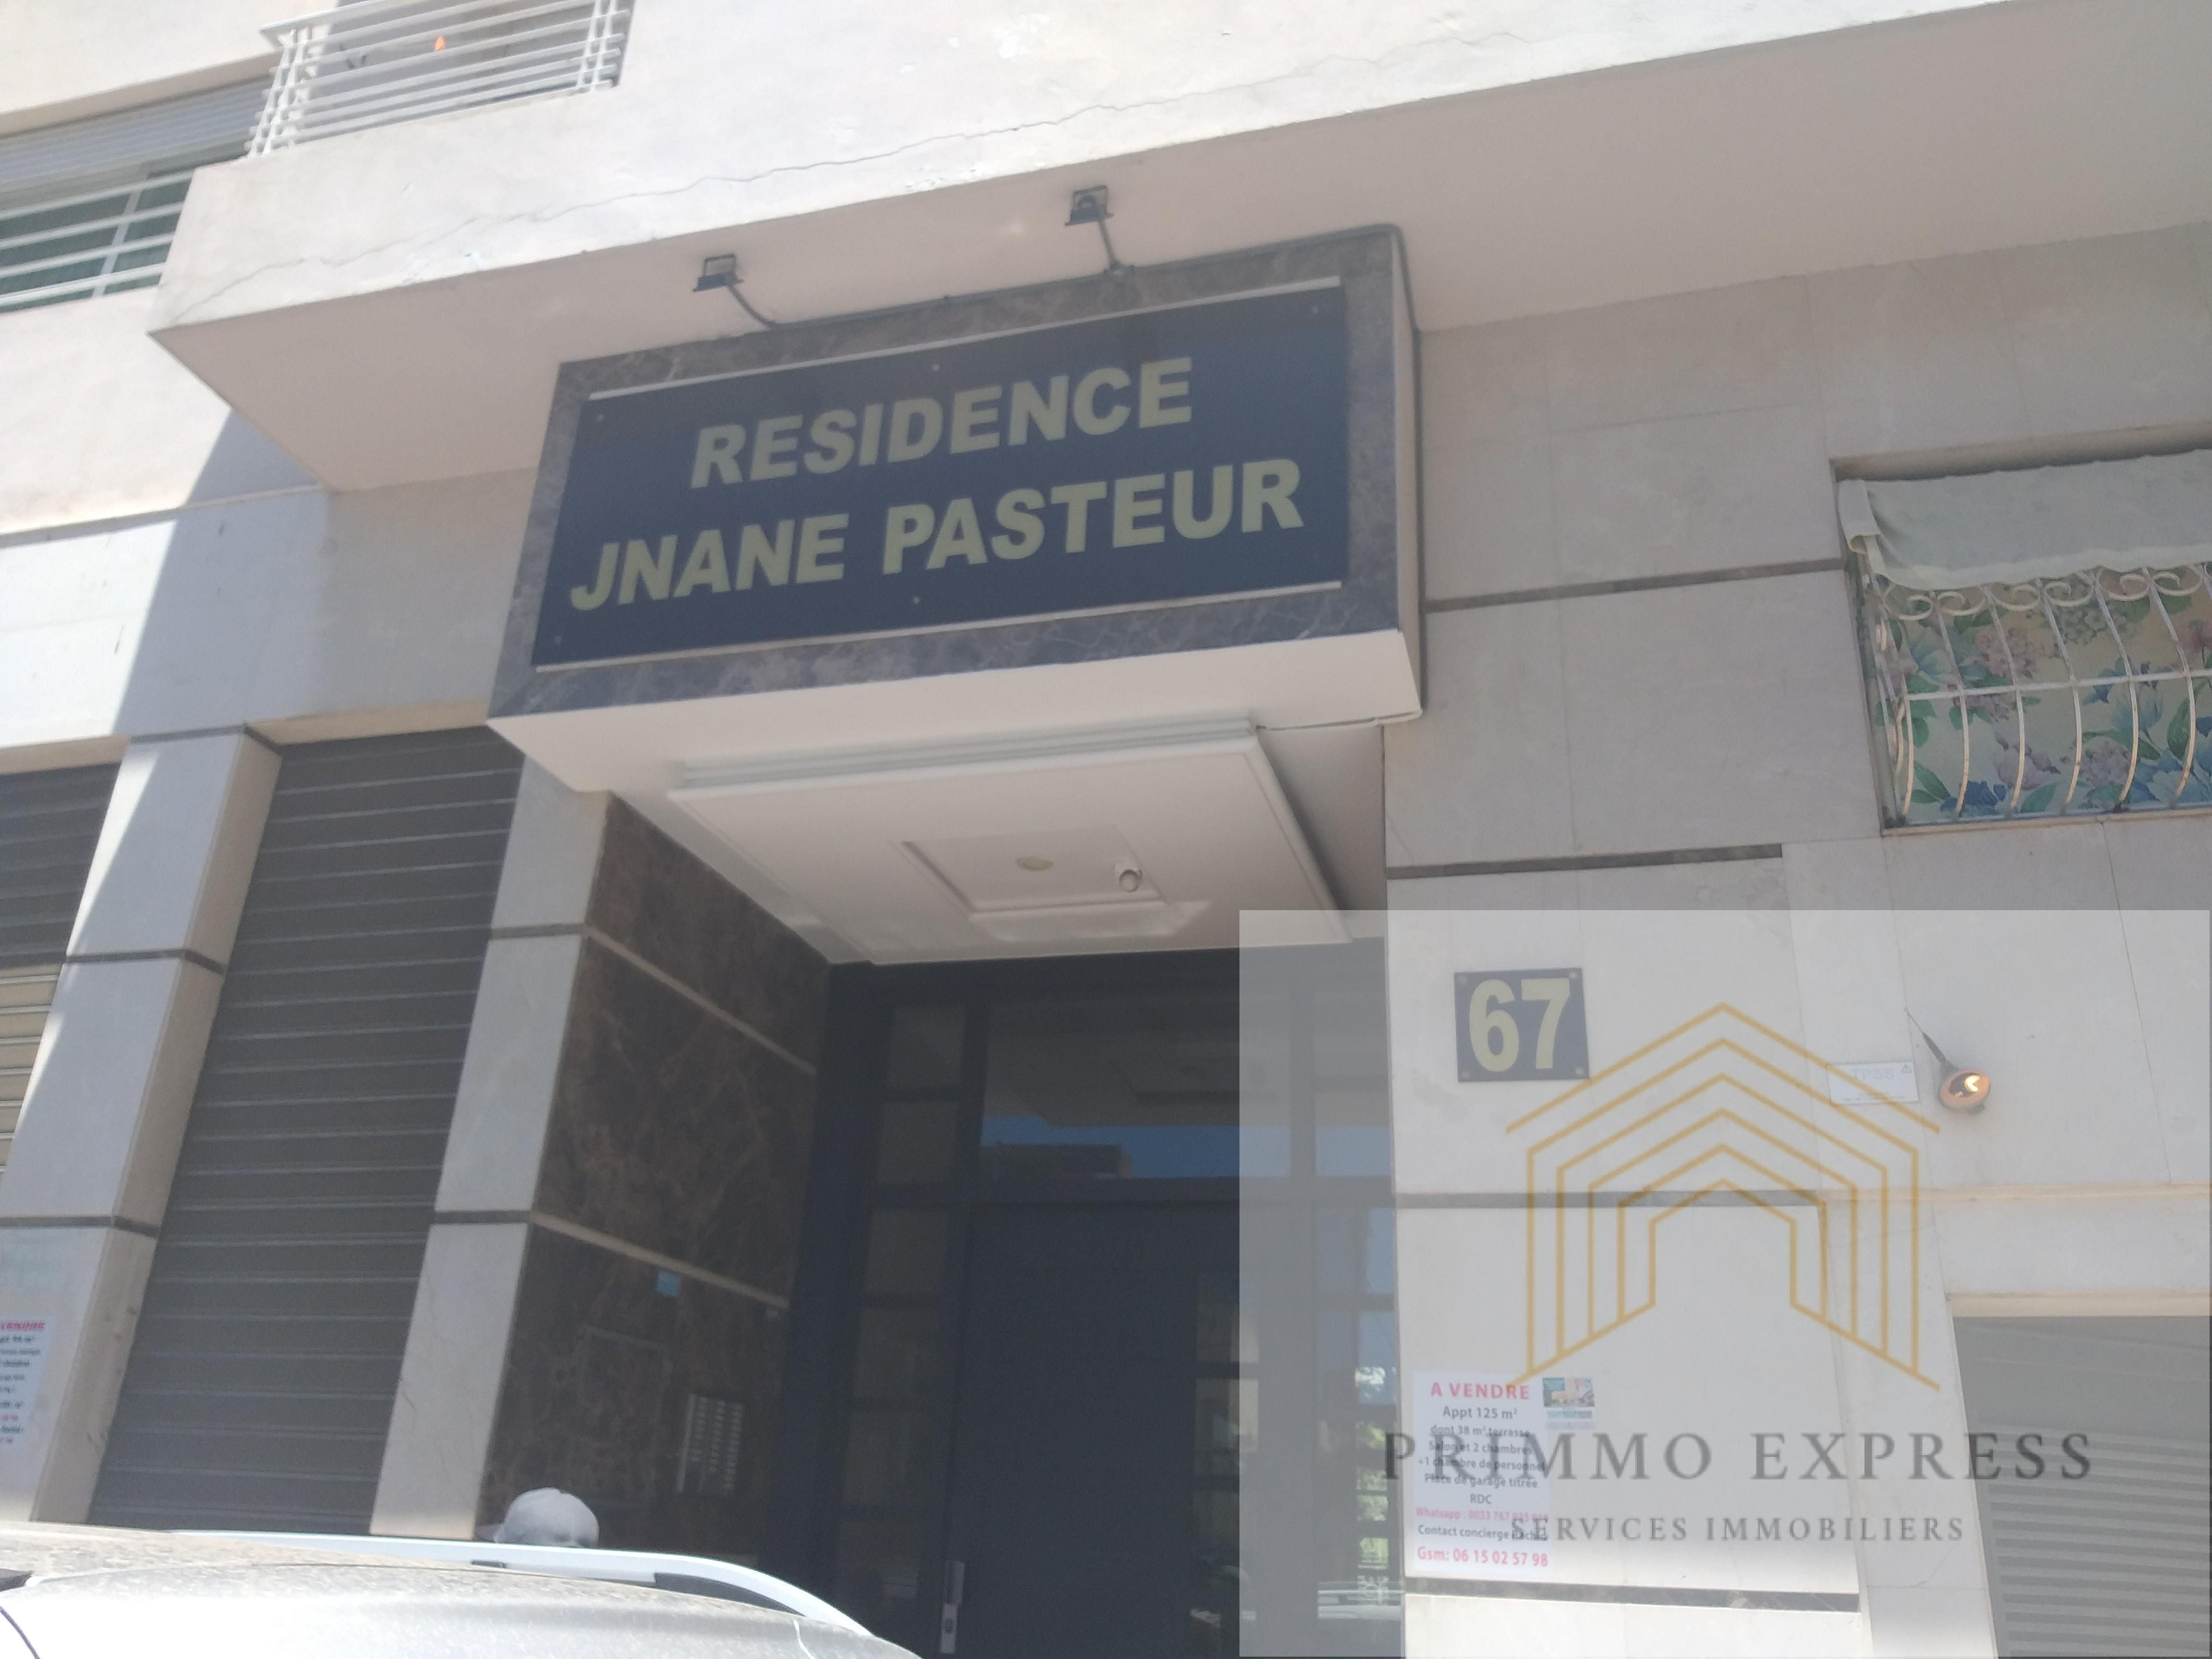 Vente <strong>Appartement</strong> Casablanca 2 Mars <strong>94 m2</strong>